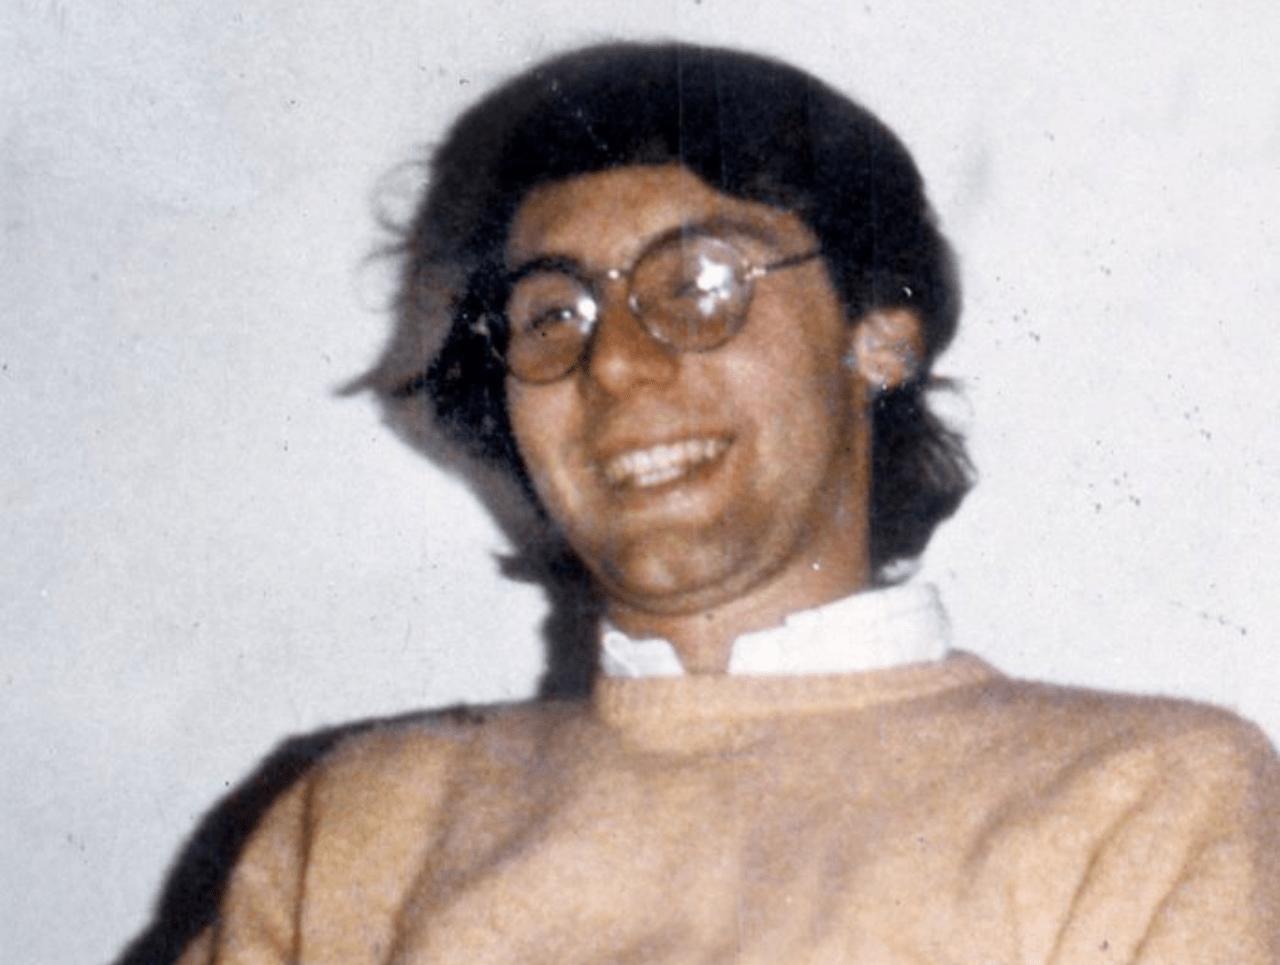 Giancarlo Siani - Foto di Fondazione Giancarlo Siani